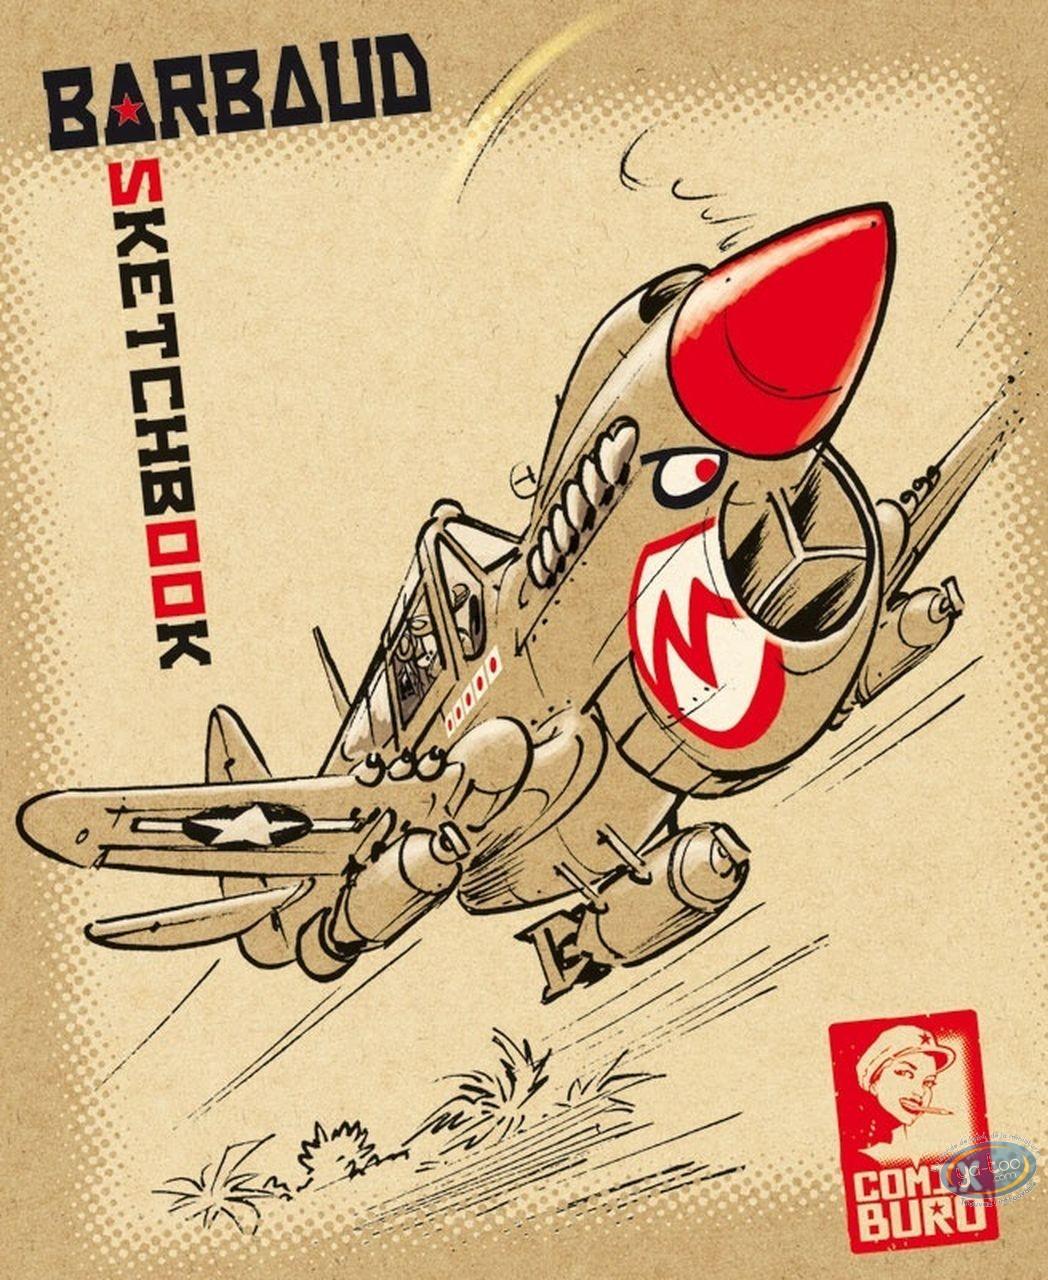 Reduced price European comic books, Sketchbook : Barbaud